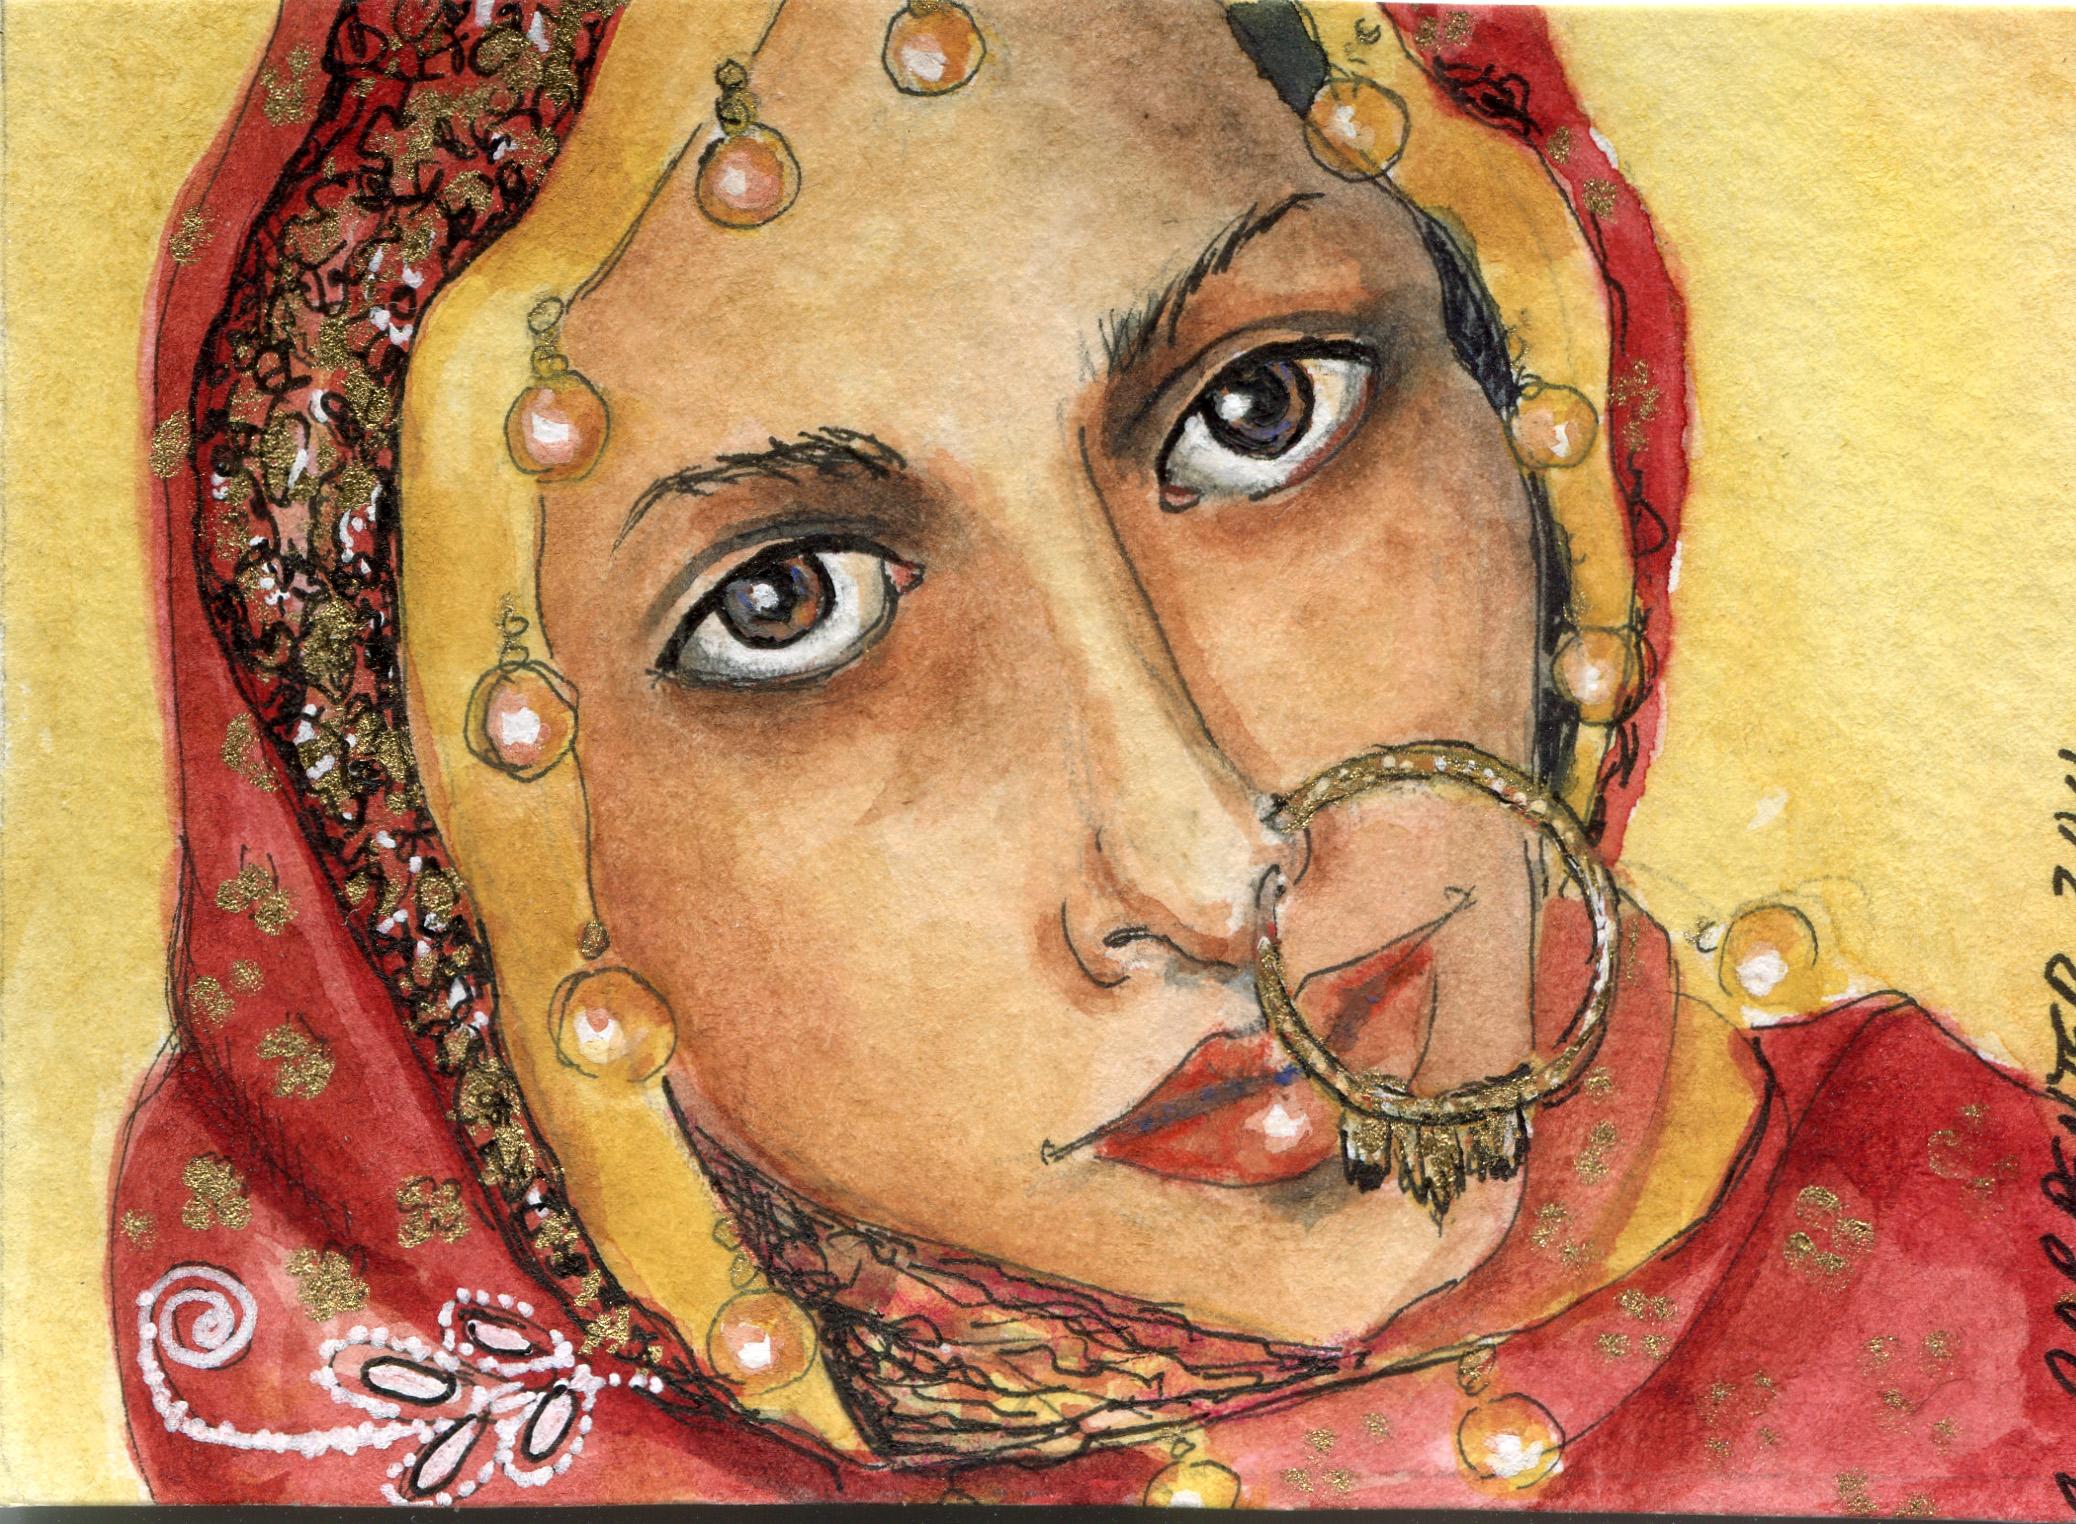 Exotic Indian Women swap loves gaze